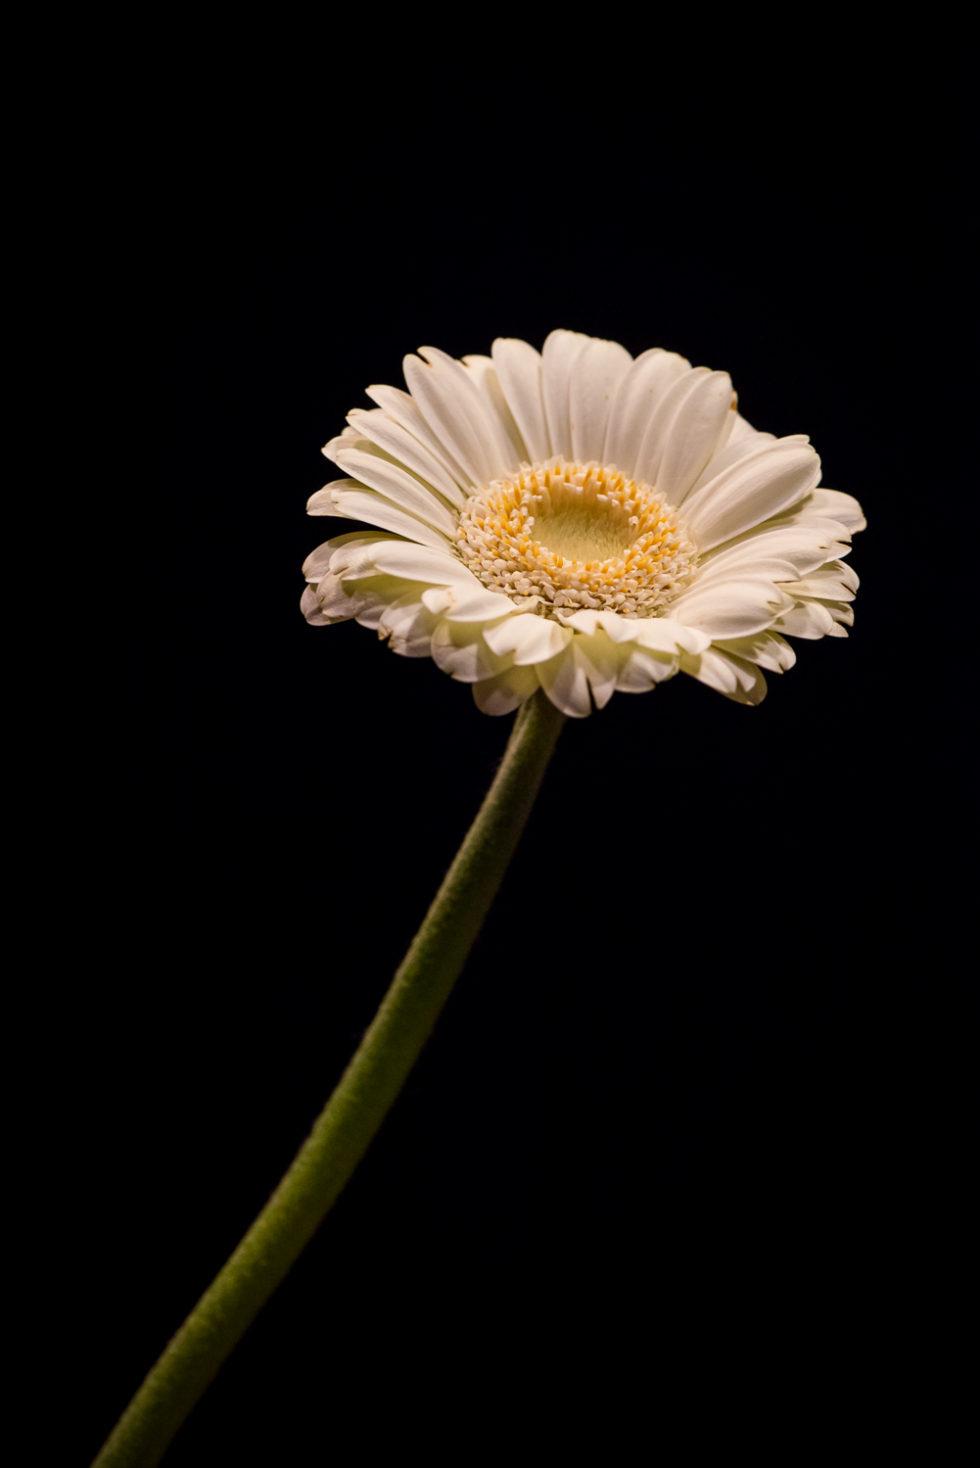 186-365v3 Just a Flower